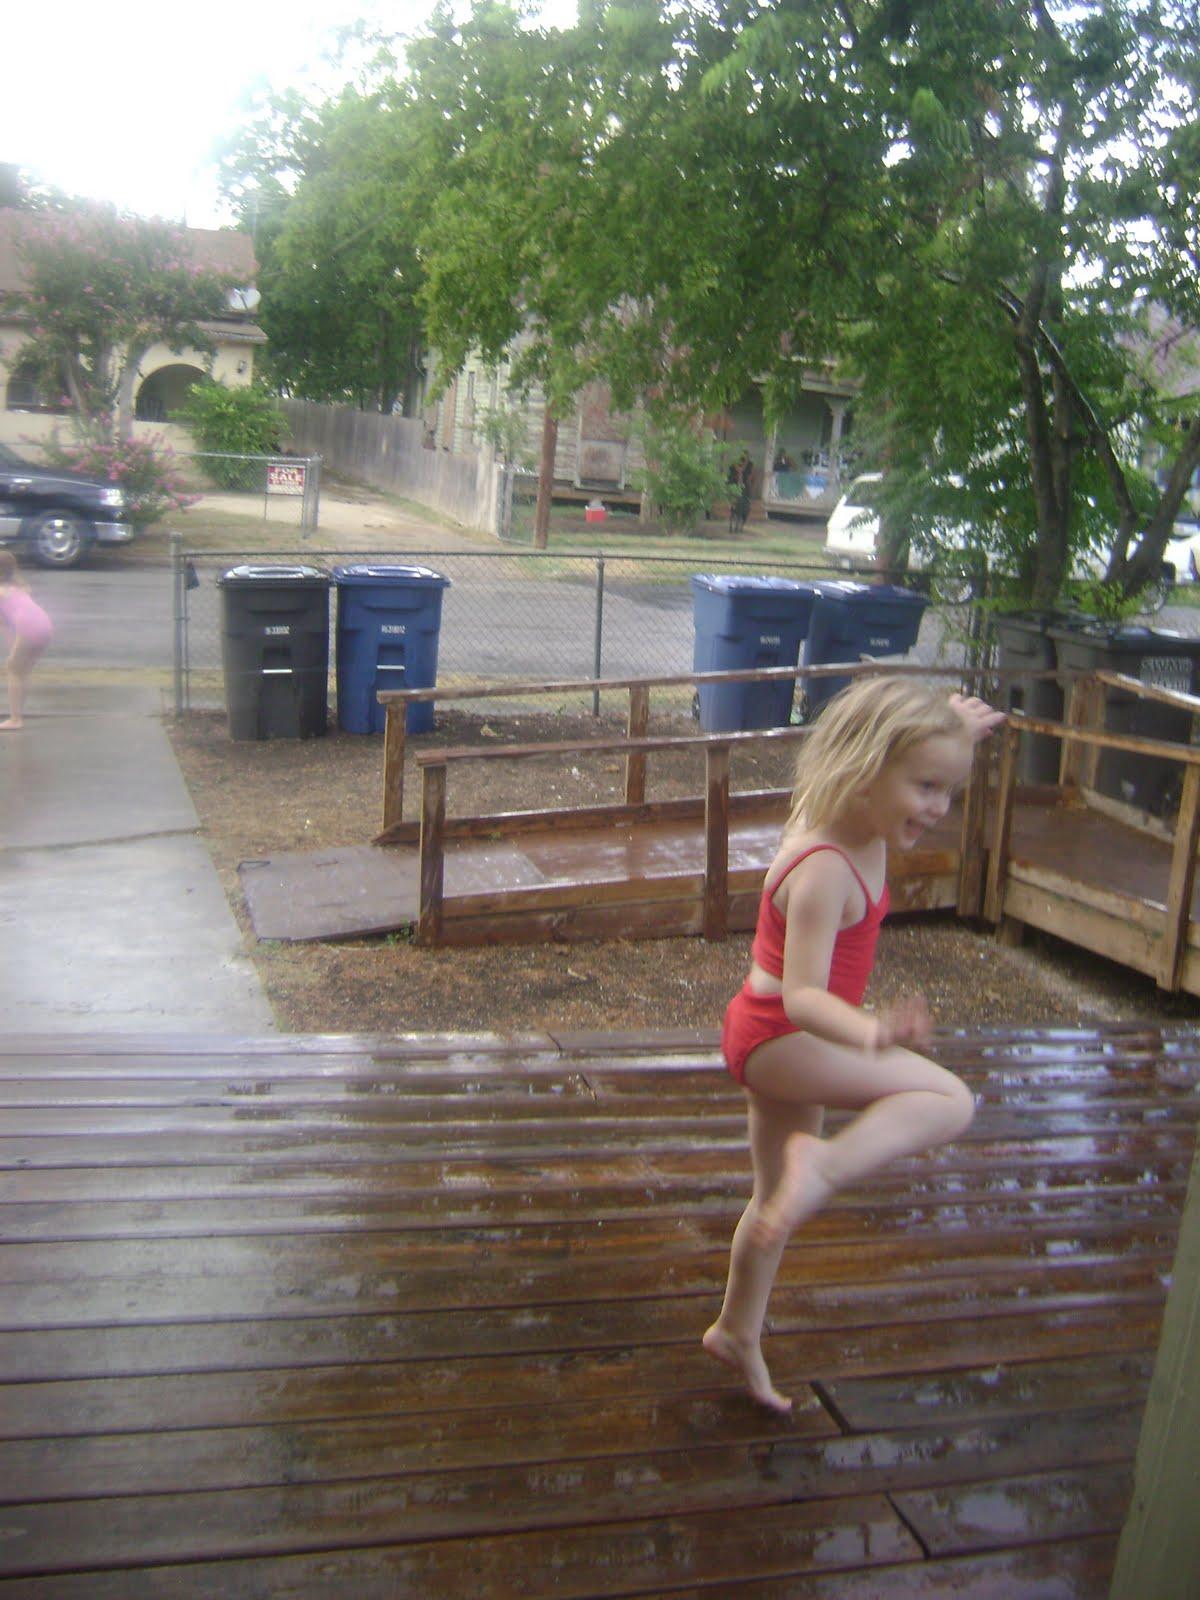 Tiny girls pissing in public